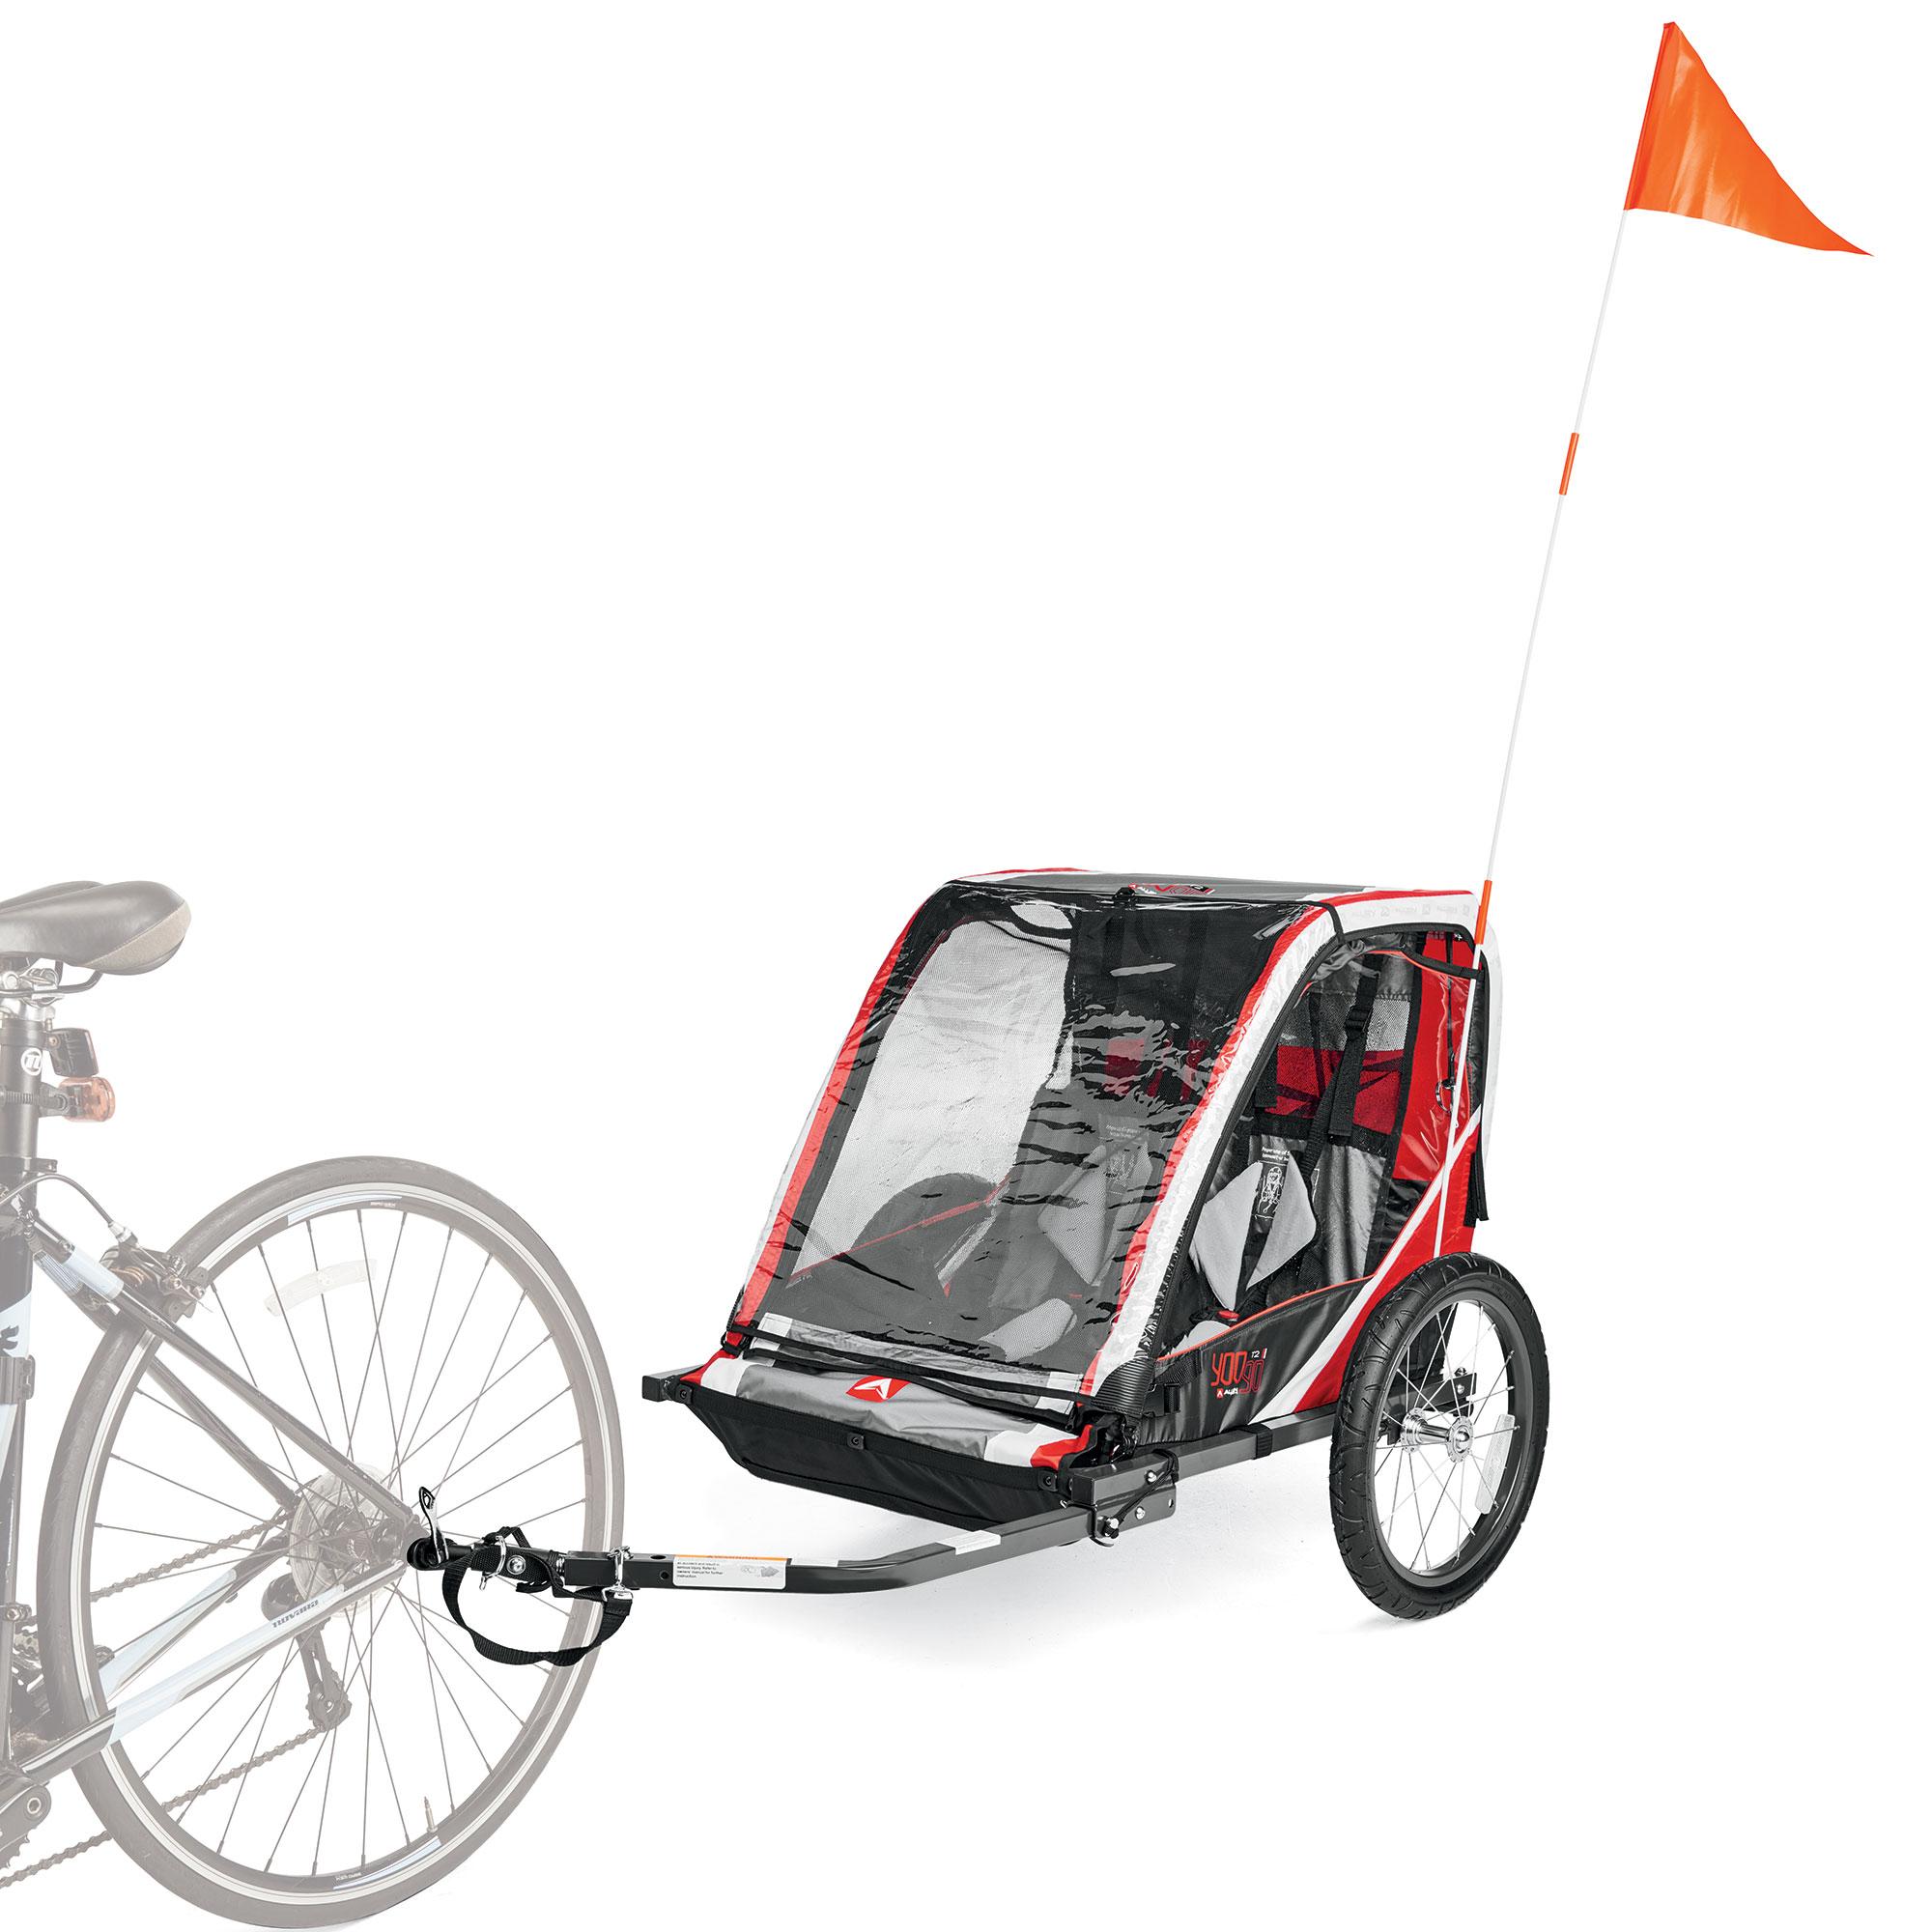 Allen Sports T2 2-Child Steel Bicycle Trailer (Red) $99 at Walmart